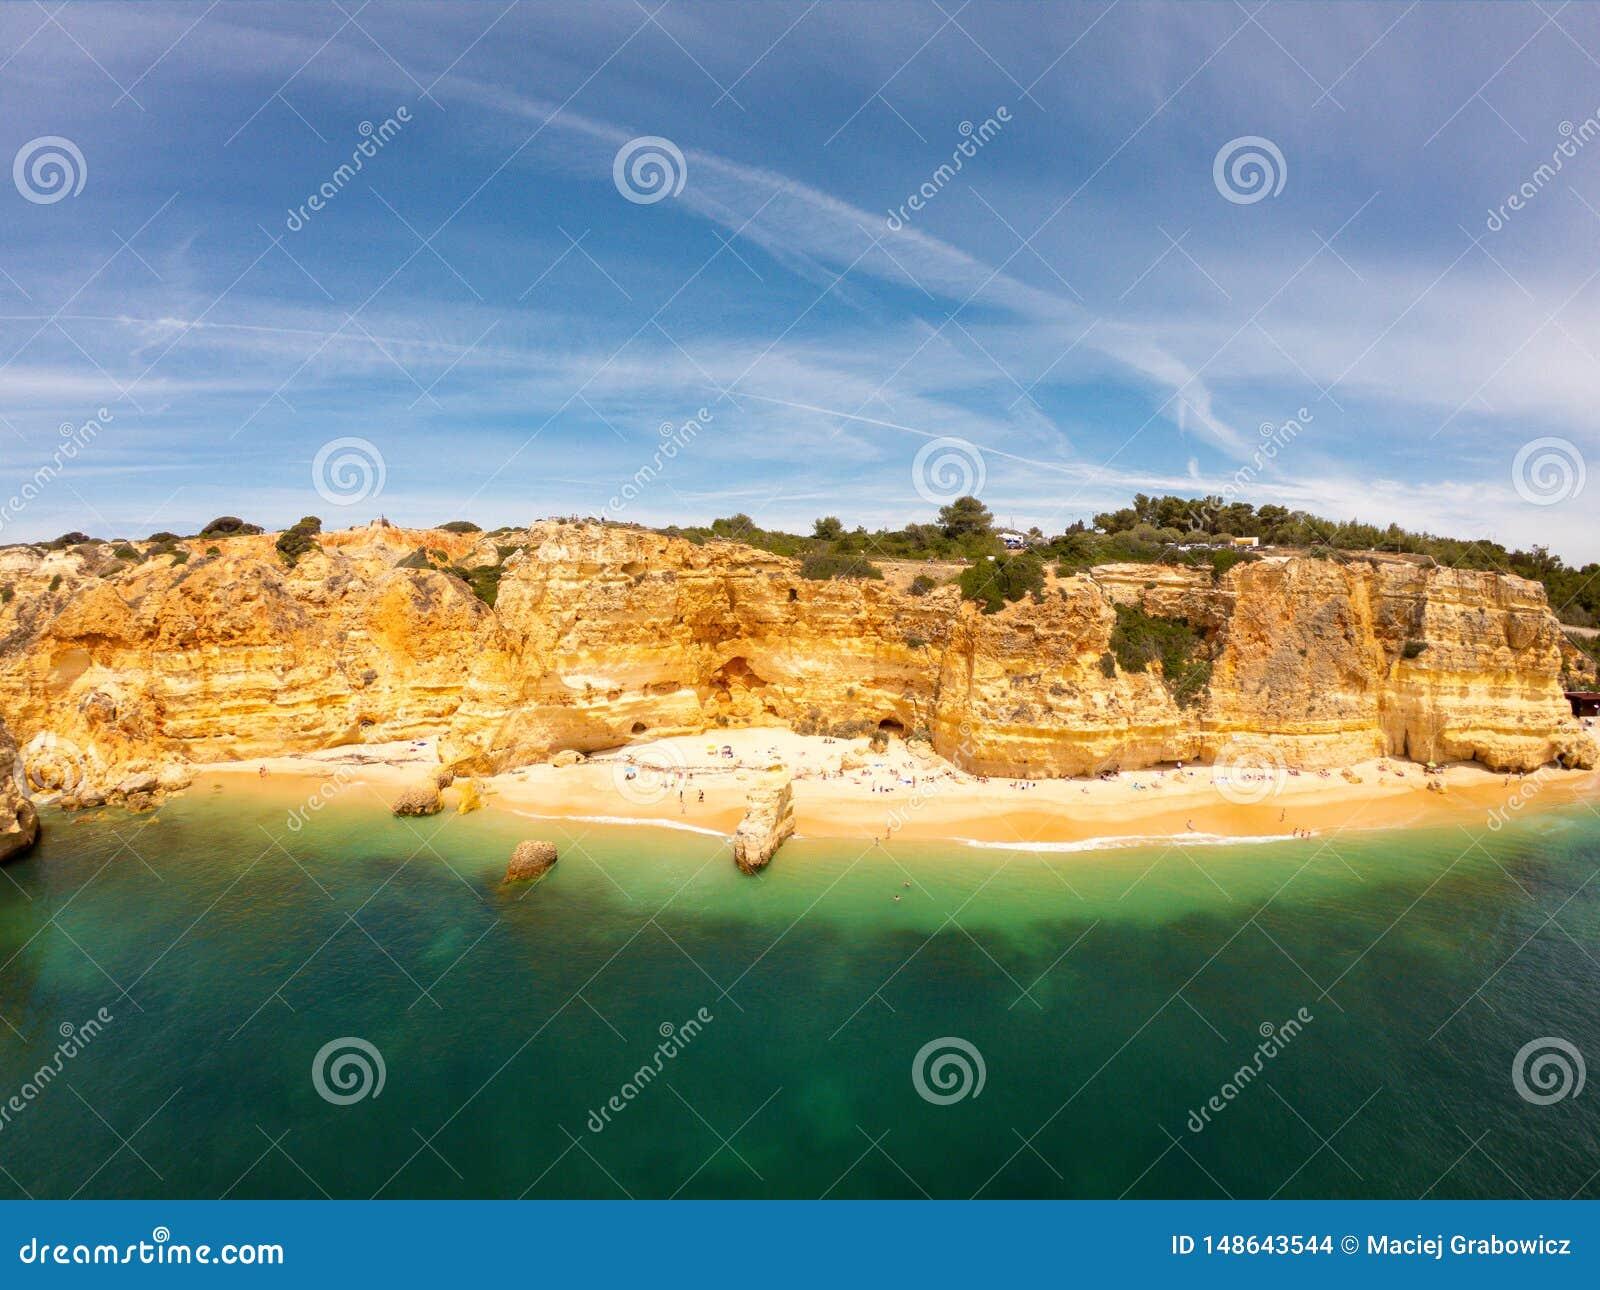 Praia De Marinha Most beautiful beach in Lagoa, Algarve Portugal. Aerial view on cliffs and coast of Atlantic ocean